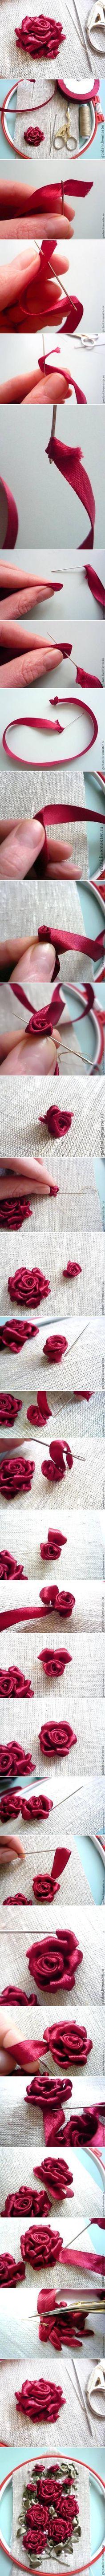 Belles beau ruban rose de bricolage projets de bricolage | UsefulDIY.com